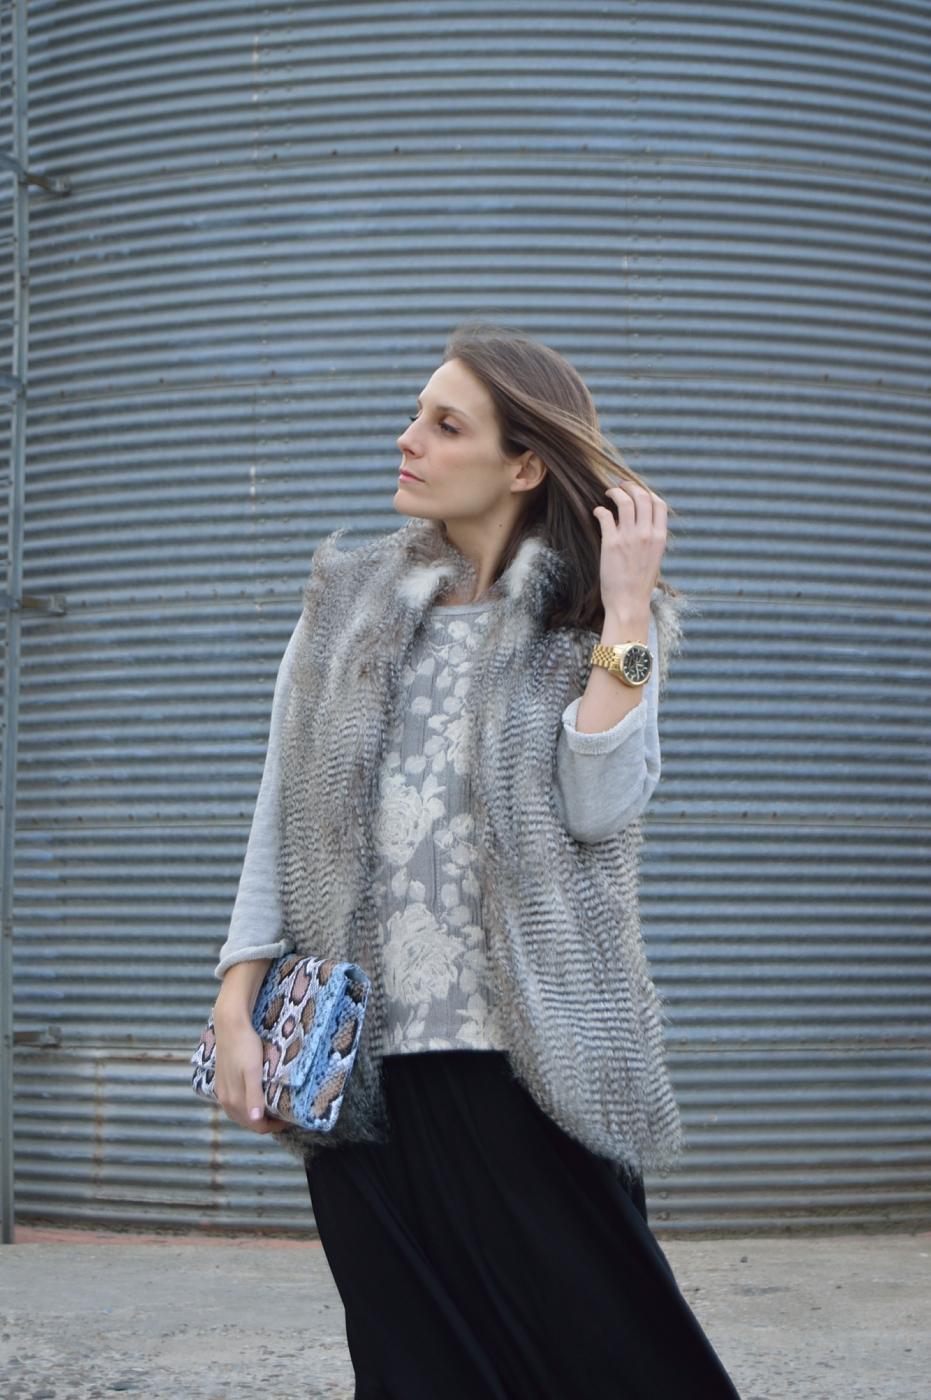 lara-vazquez-madlula-style-ootd-look-fashion-blog-faux-fur-vest